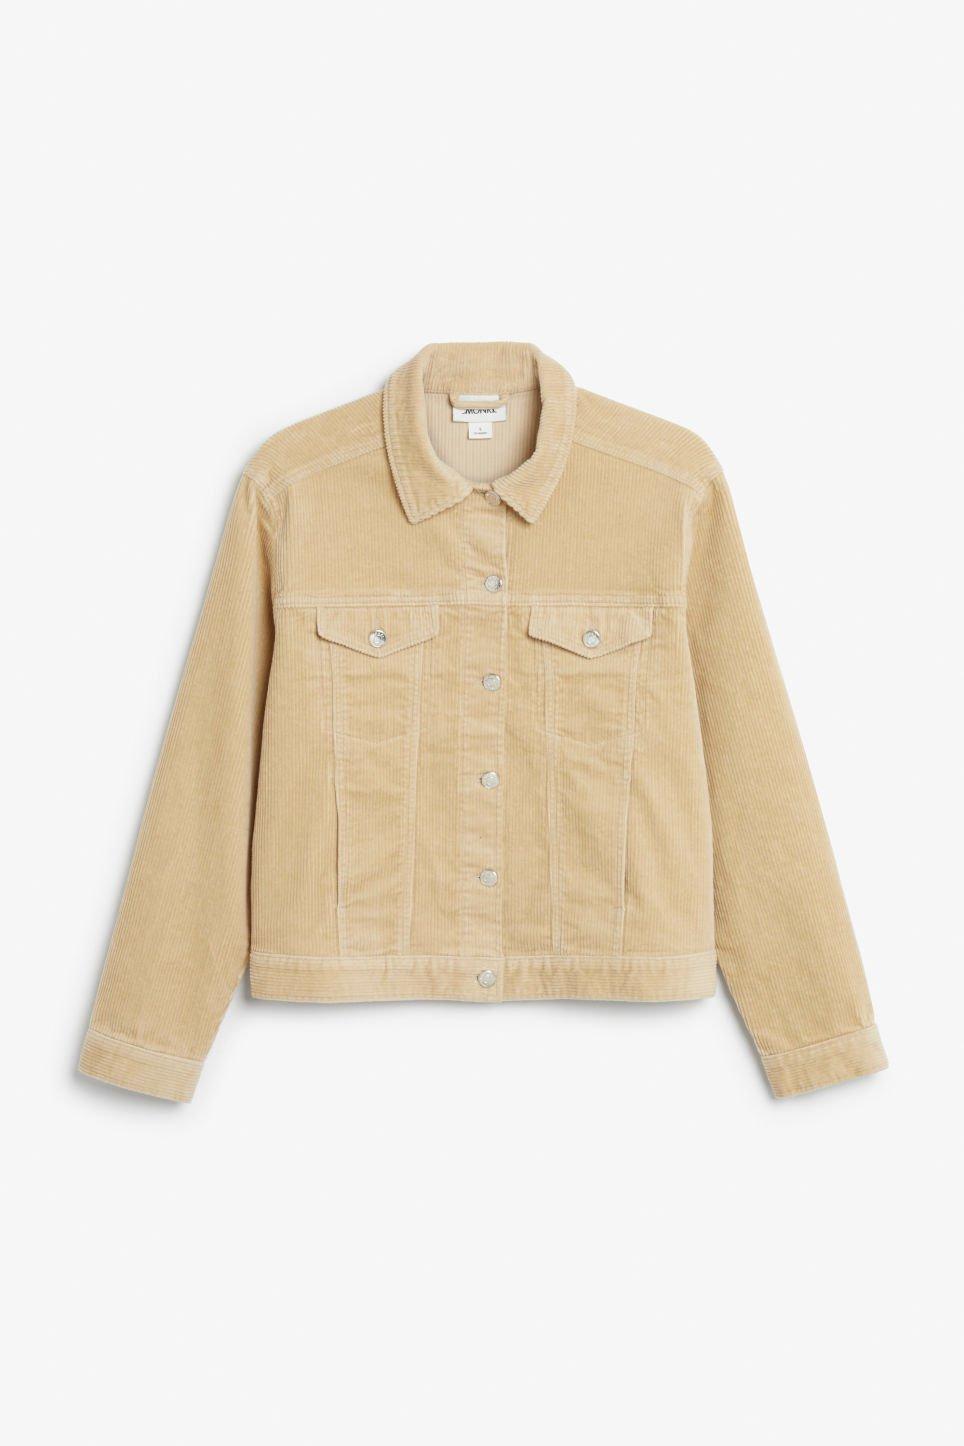 Corduroy jacket - Sunday safari beige - Coats & Jackets - Monki GB